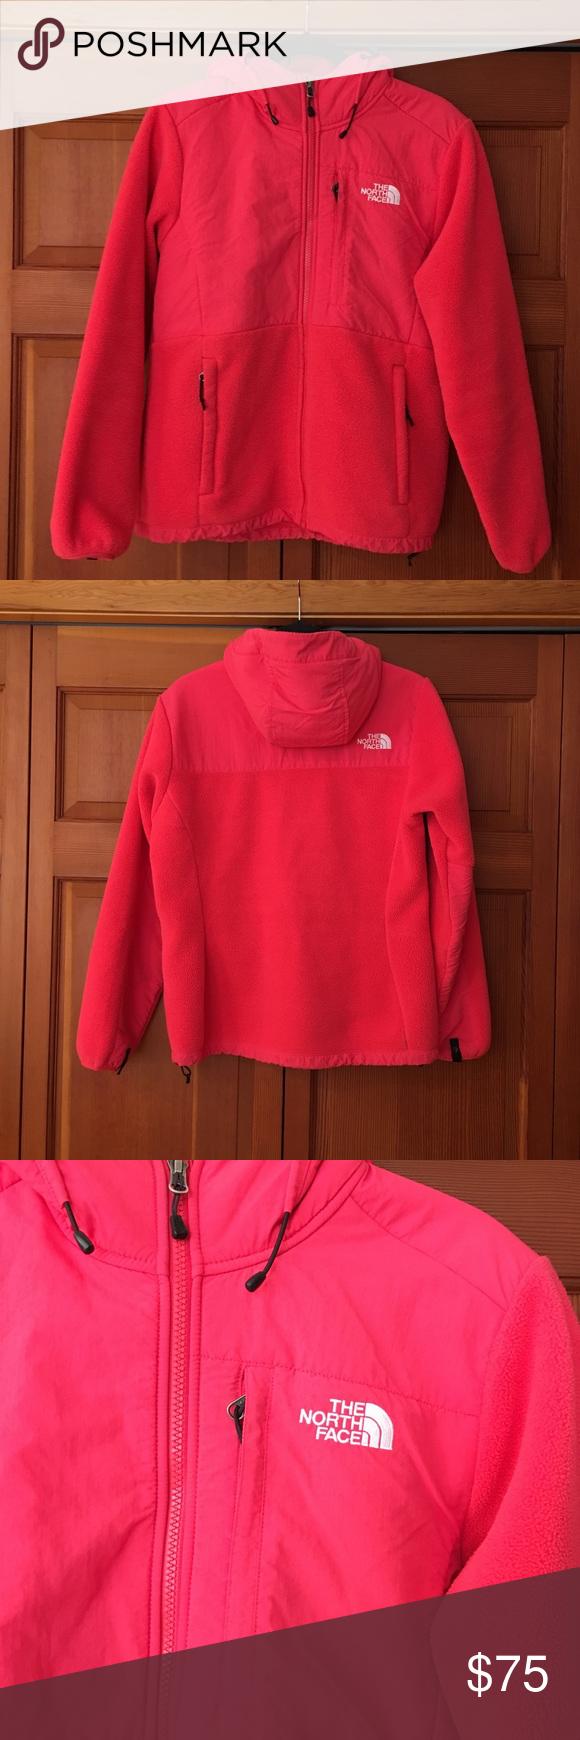 The north face denali fleece jacket north face women coral color